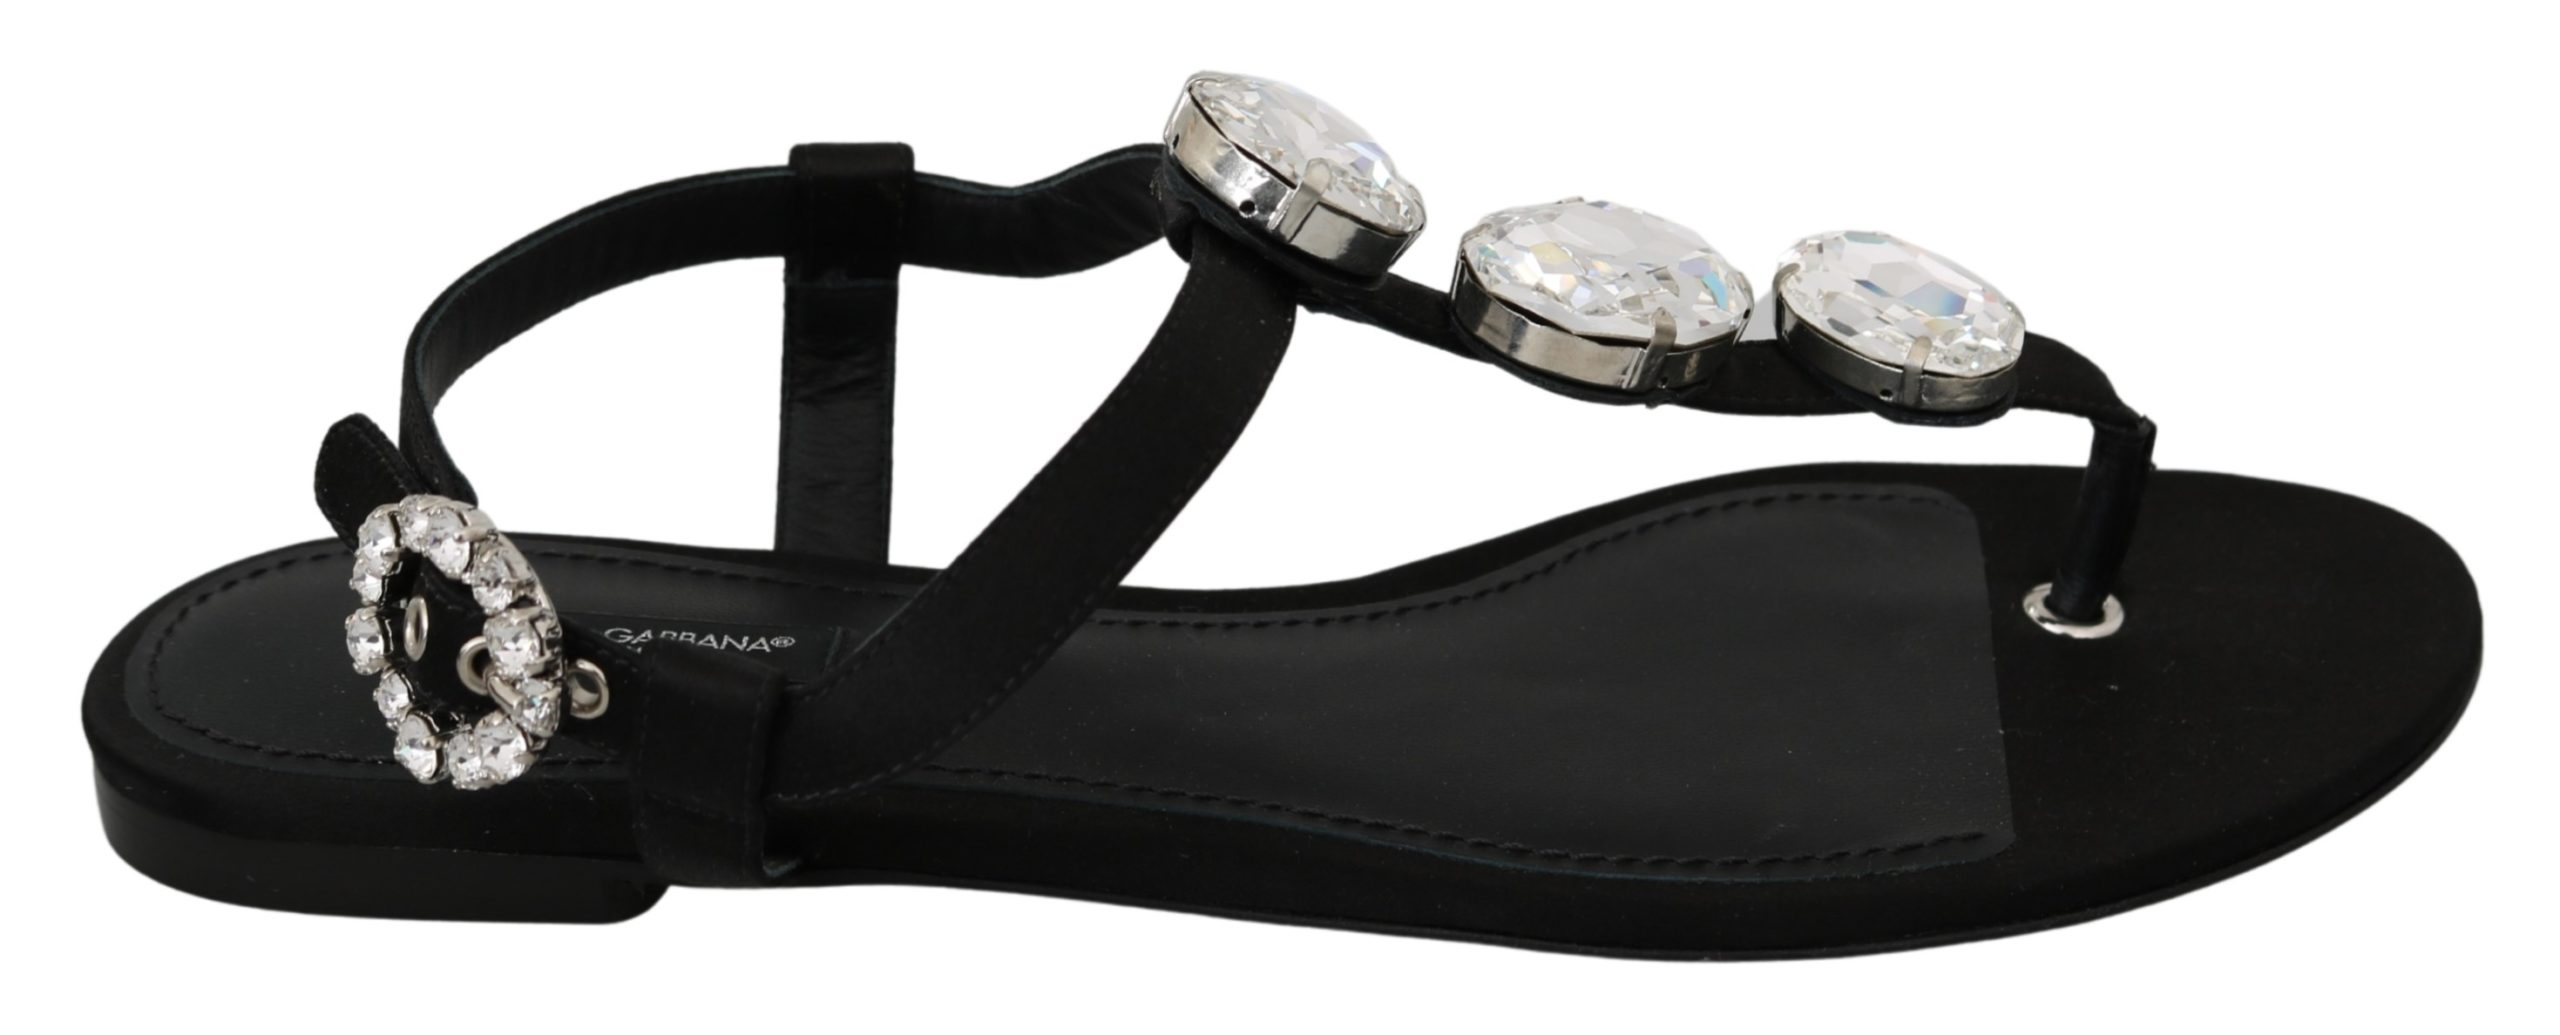 Dolce & Gabbana Women's Silk Crystal Sandal Black LA6888 - EU39/US8.5